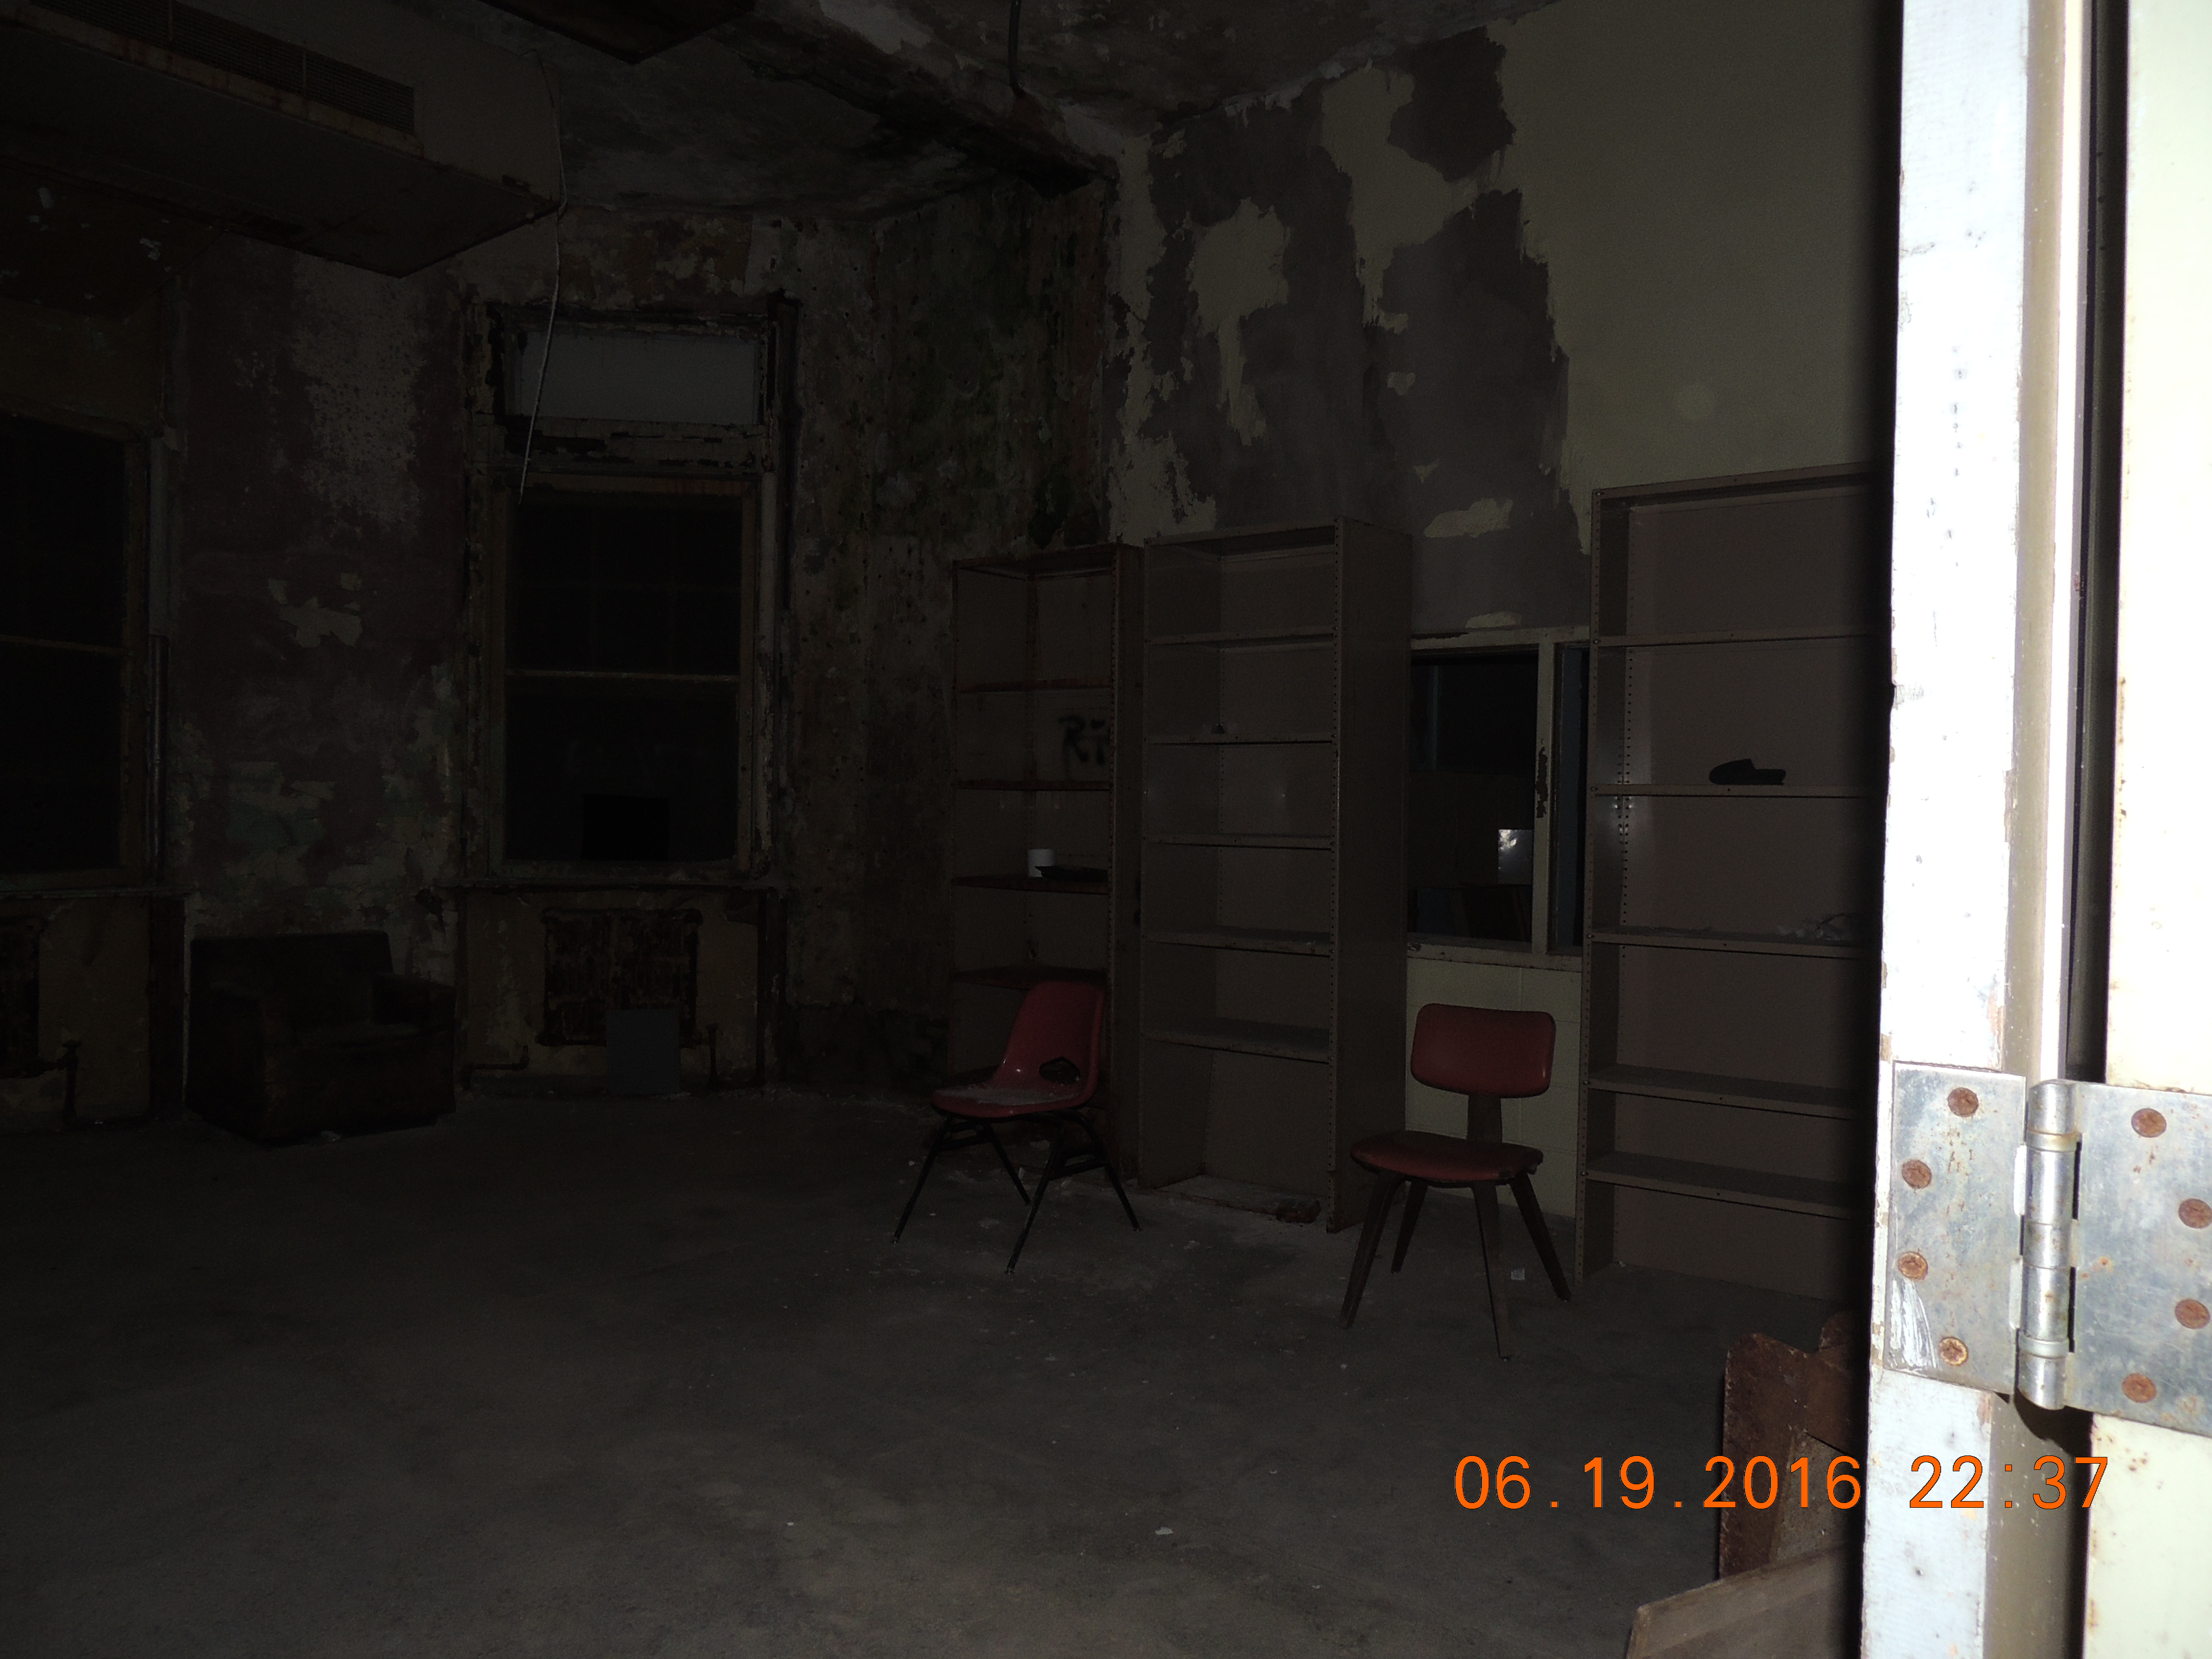 Pennhurst Investigation